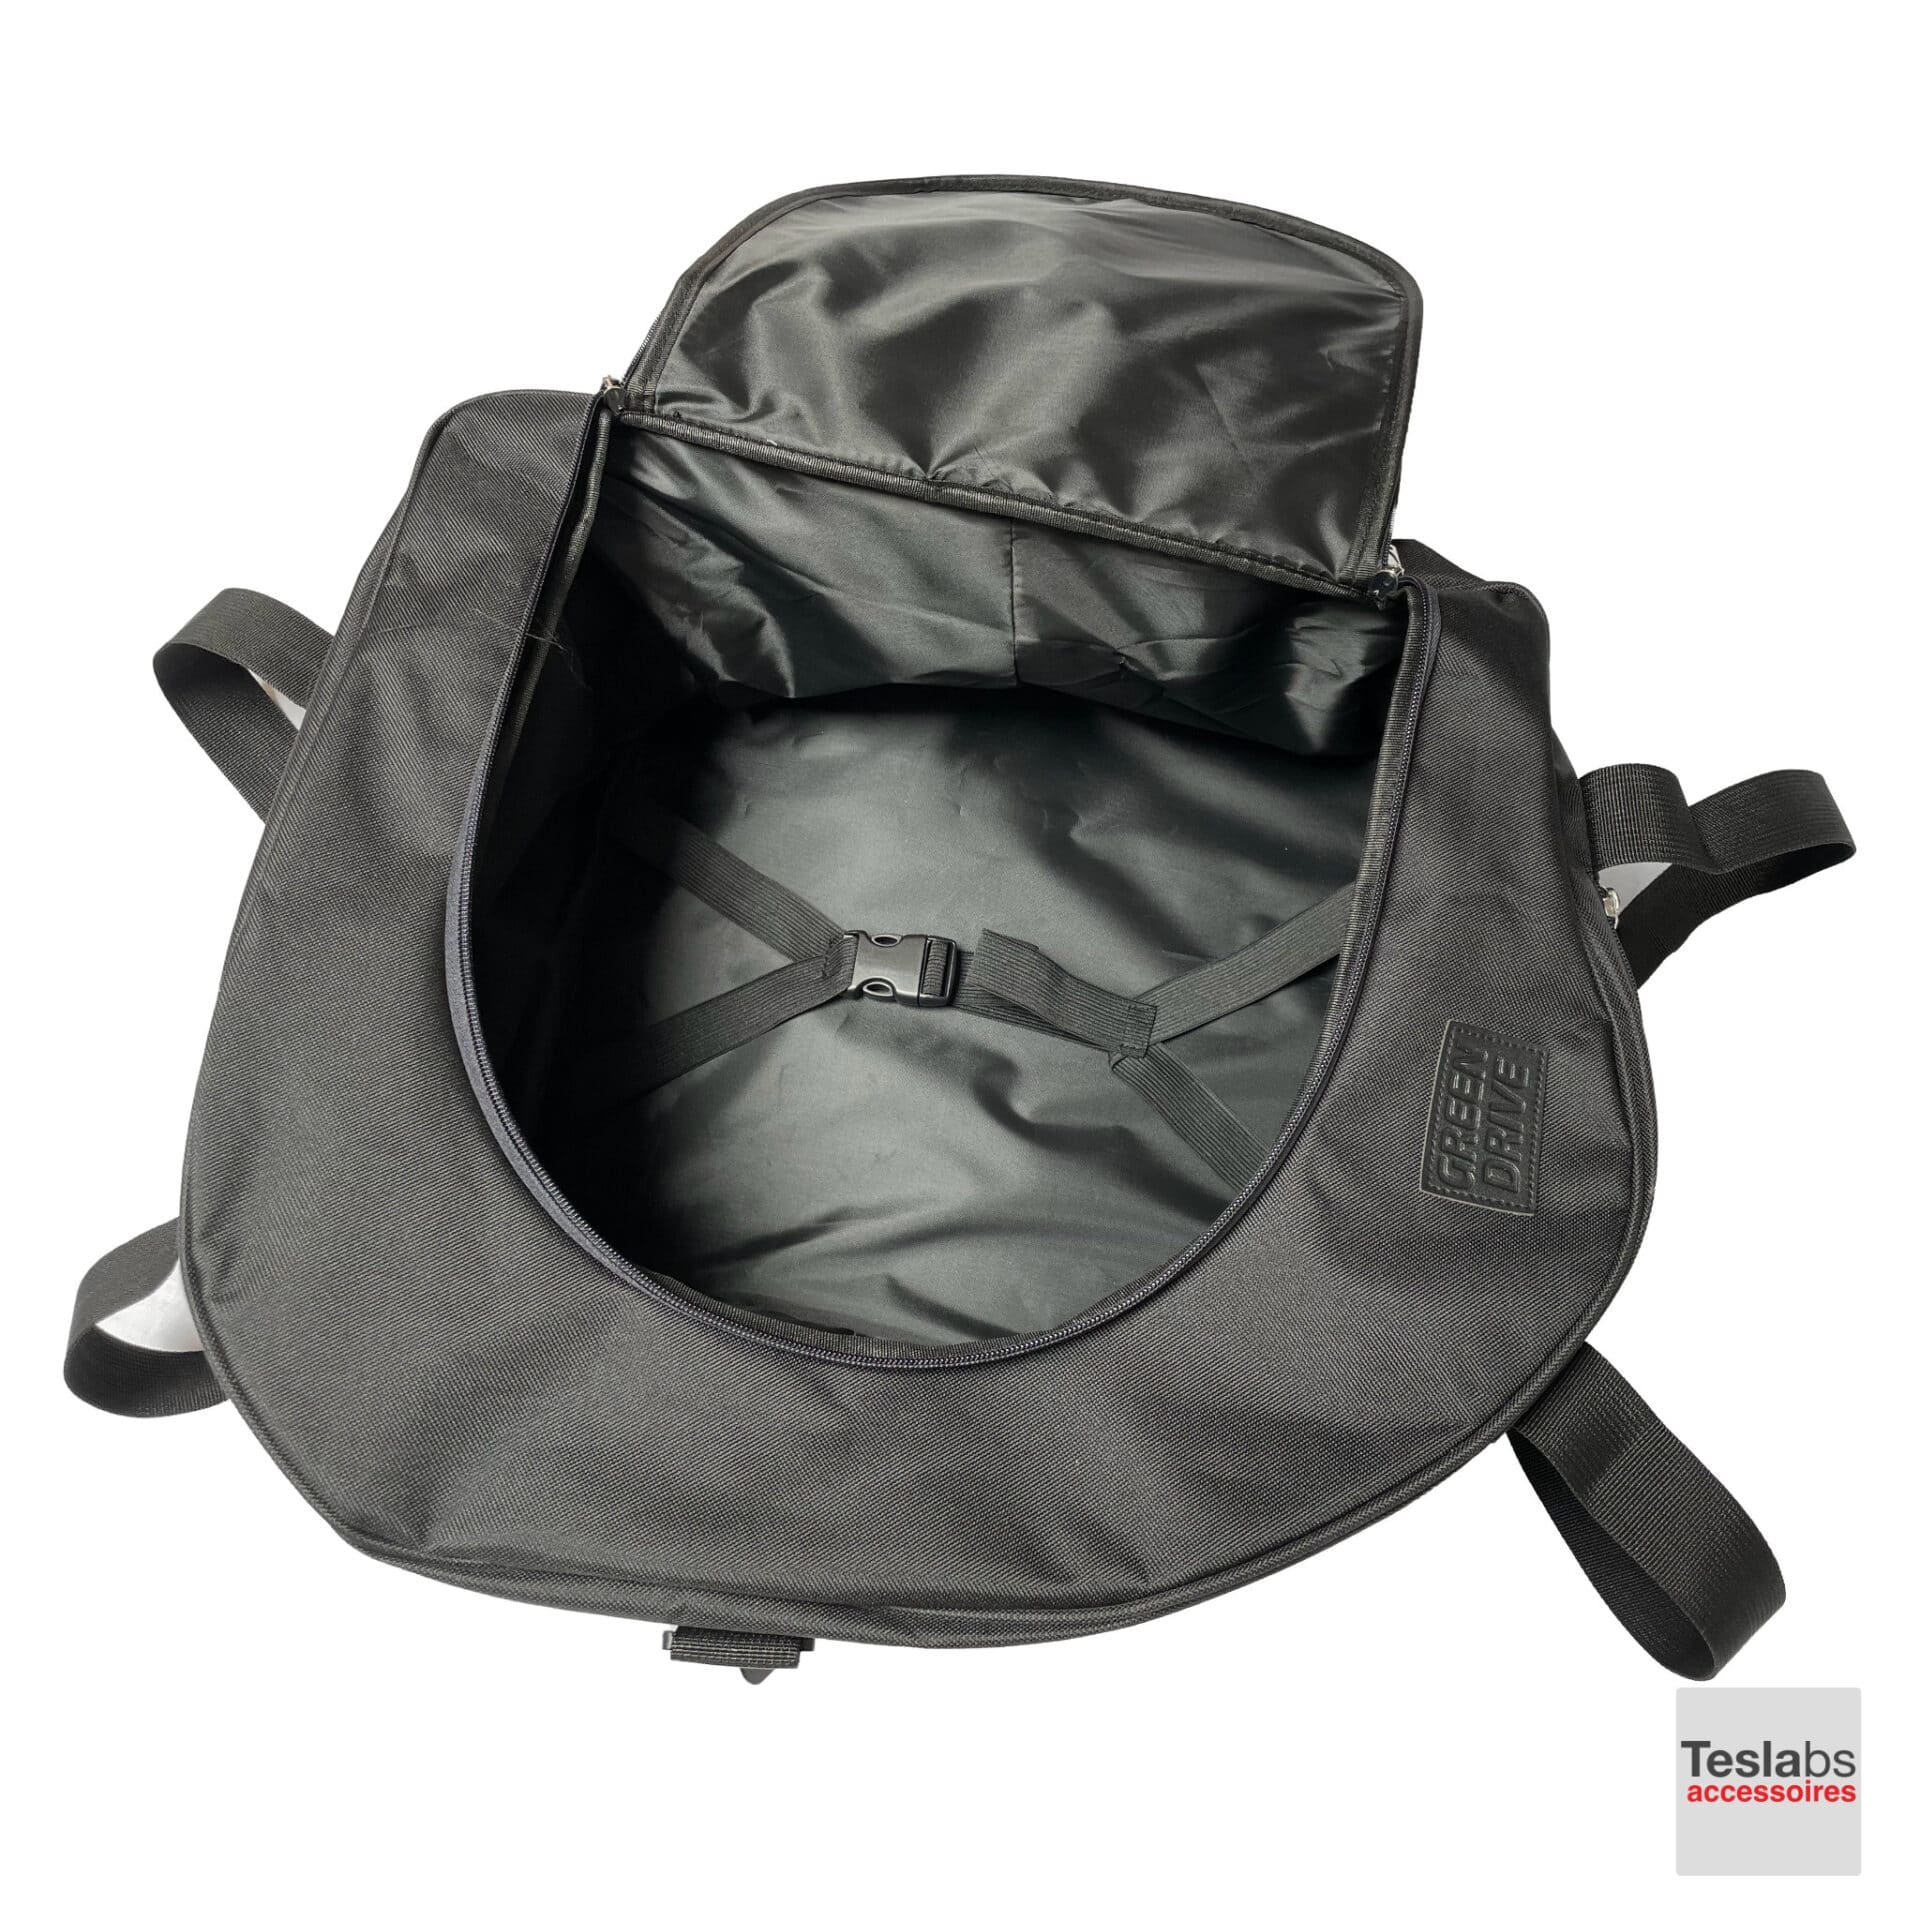 Model 3 Tas binnenkant bovenkant